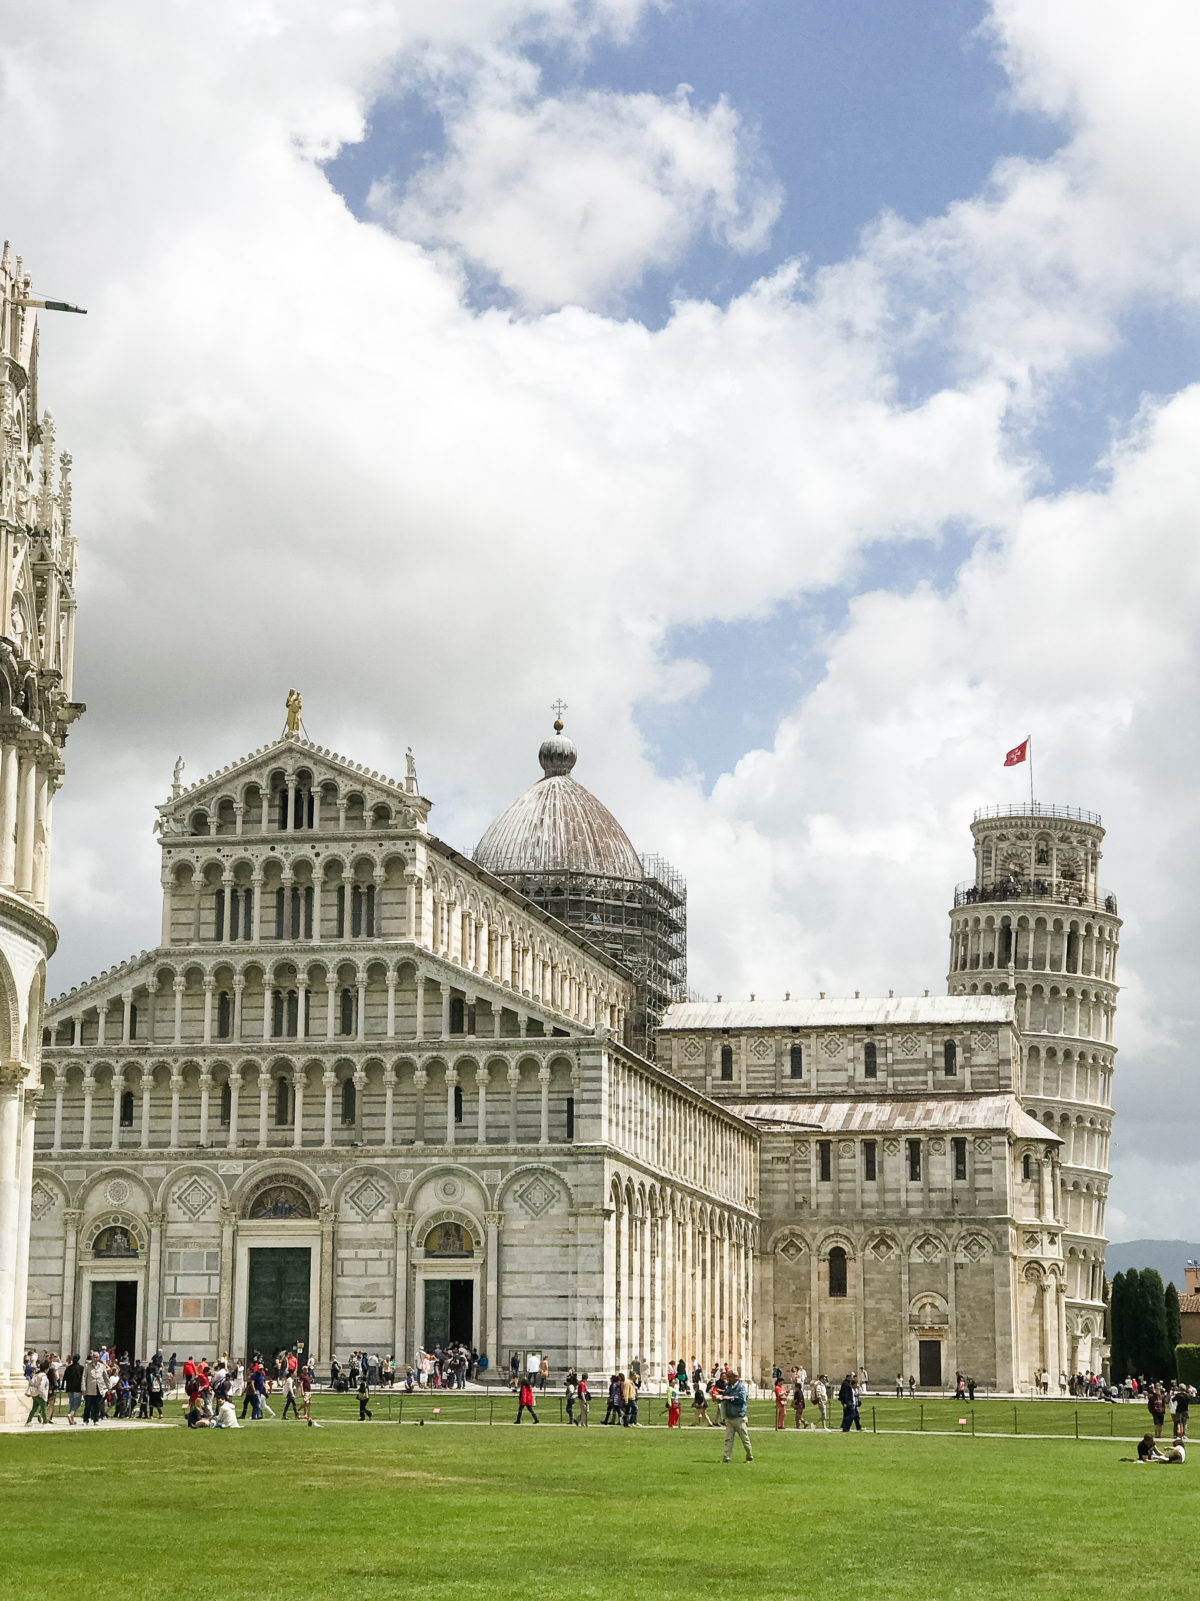 Pisa, Italy guide